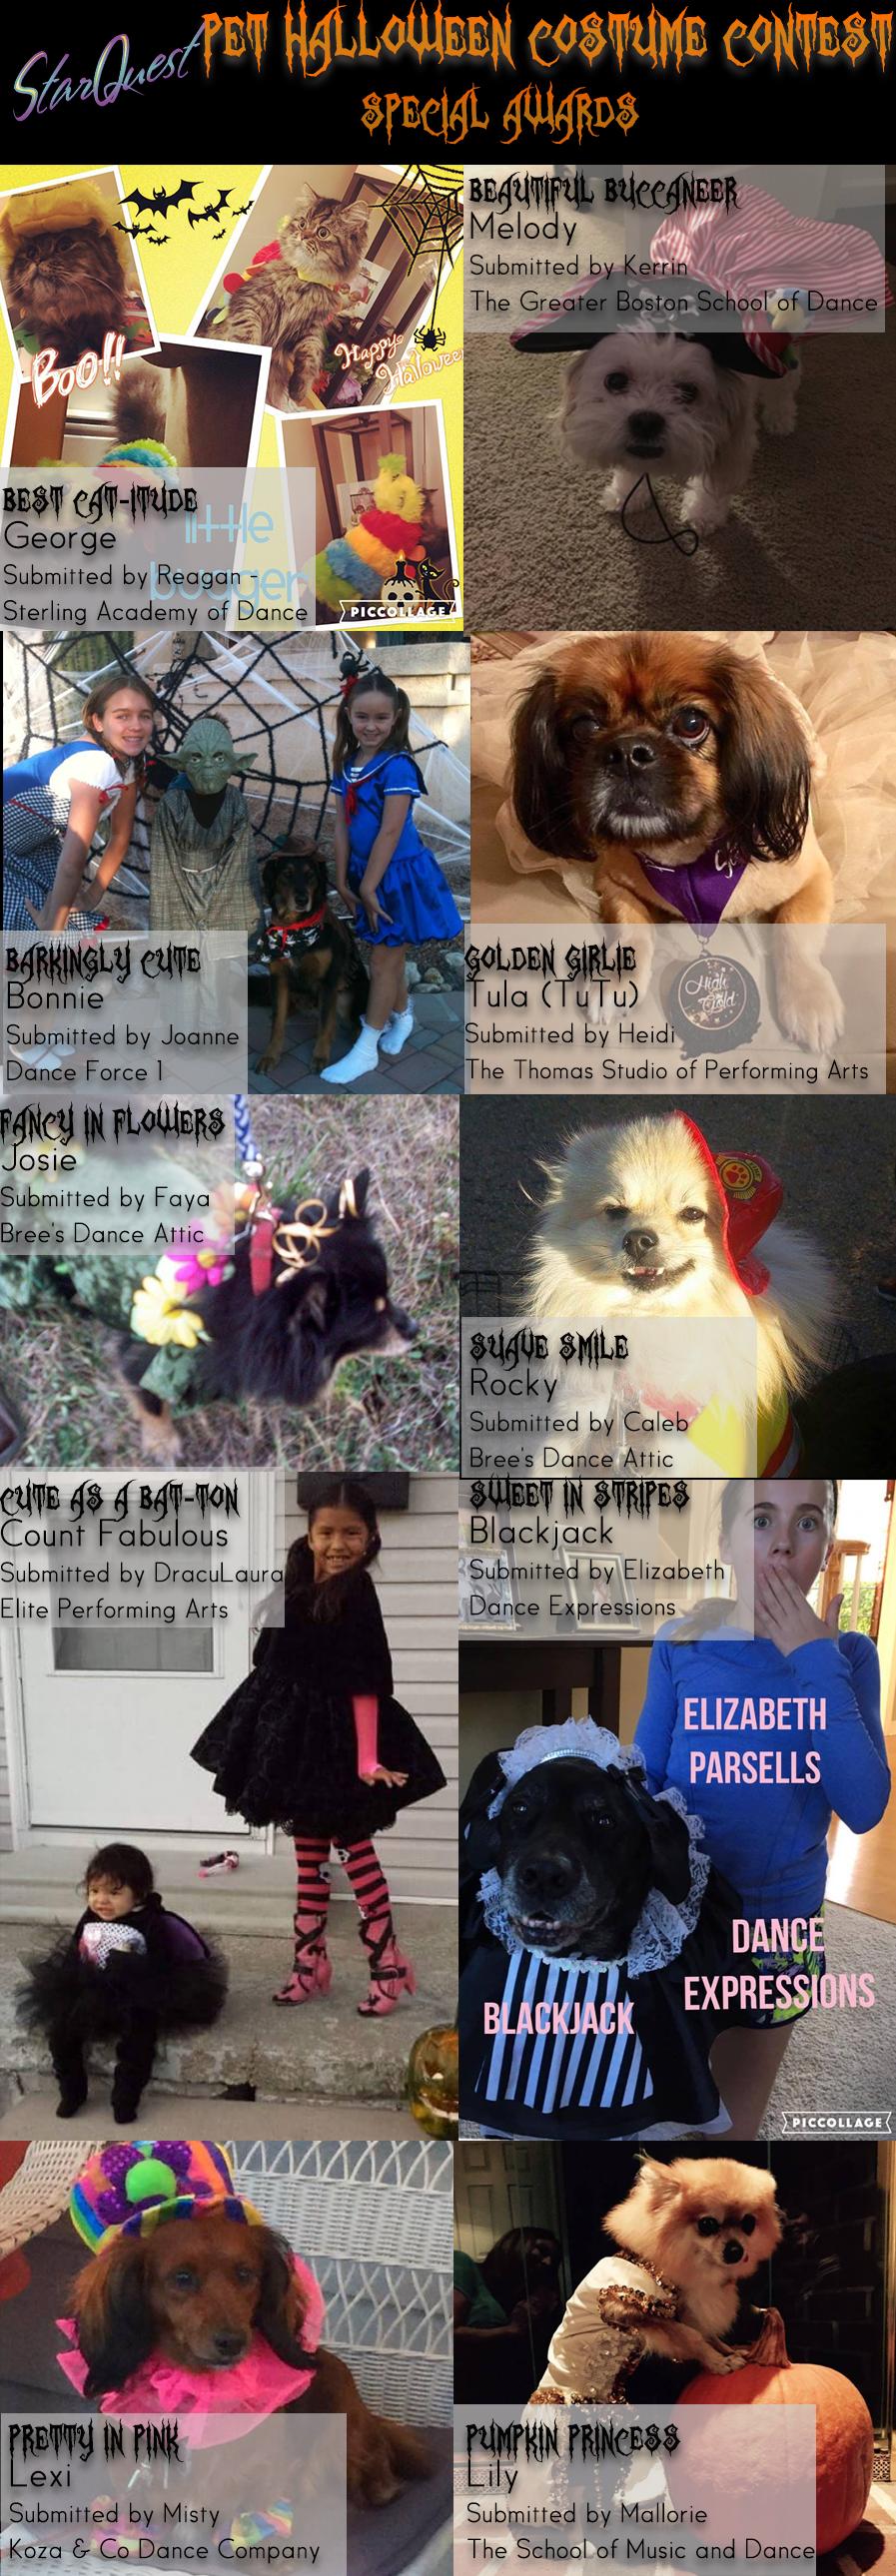 starquest, starquest dance, starquest dance competition, pet, halloween, costume, contest